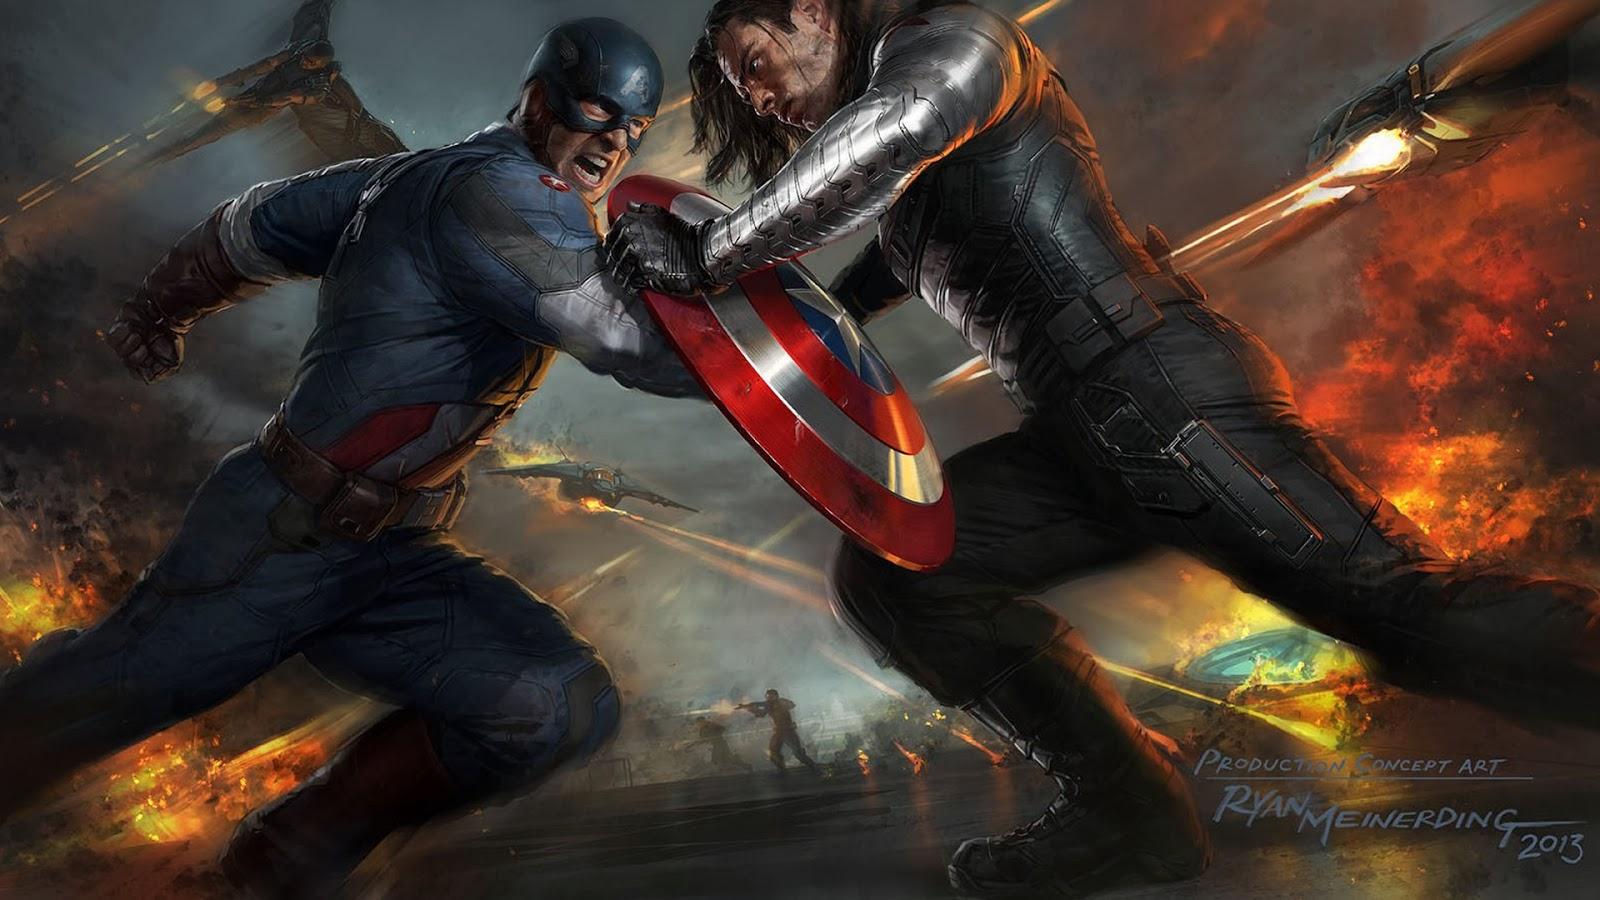 Sneak Peek Captain America The Winter Soldier In Action